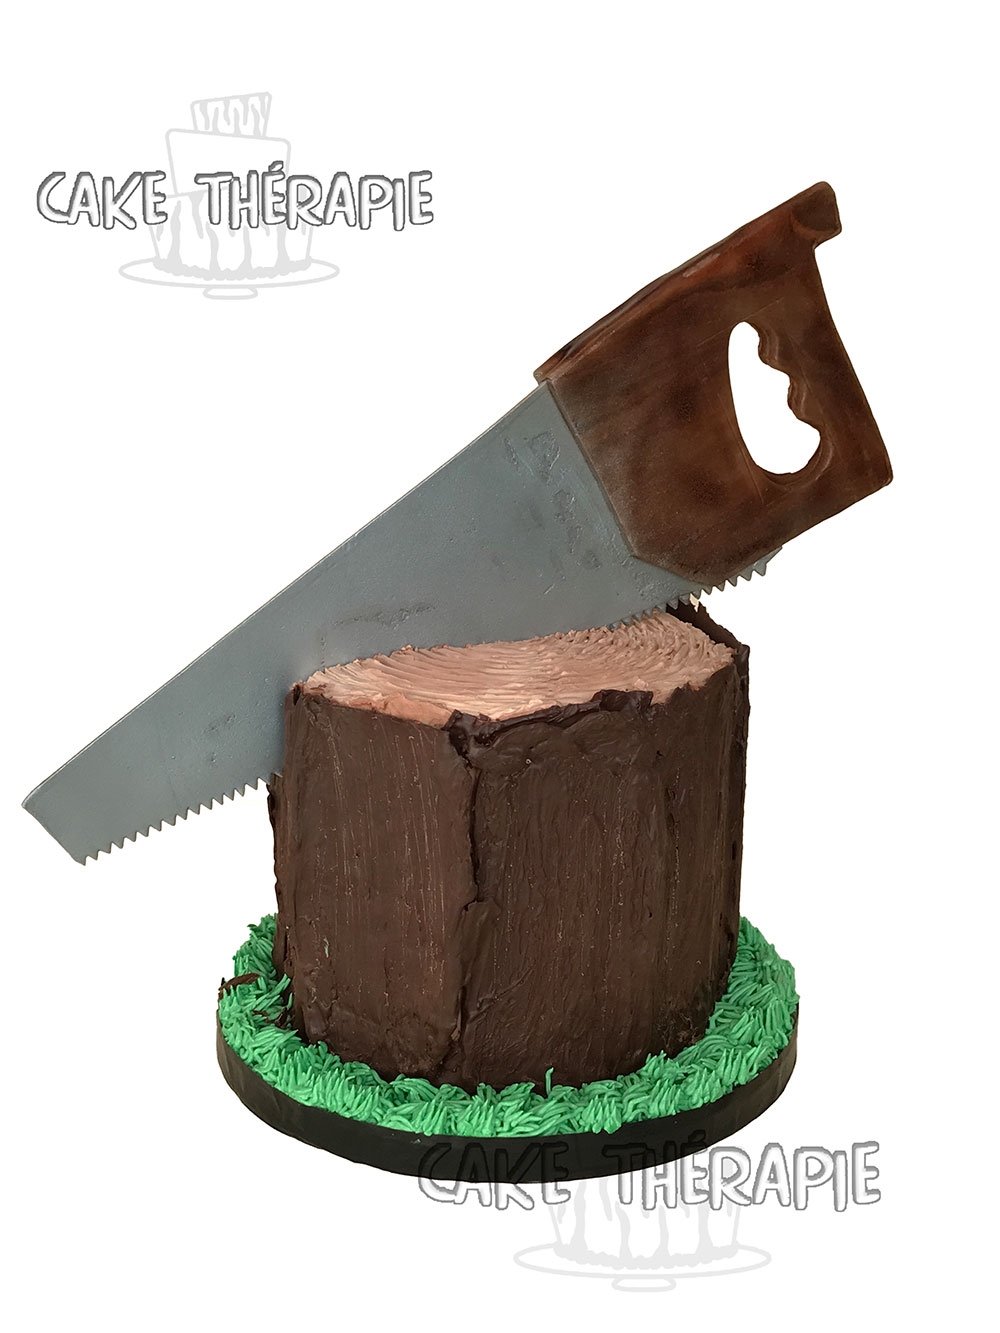 Wood Shop Cake